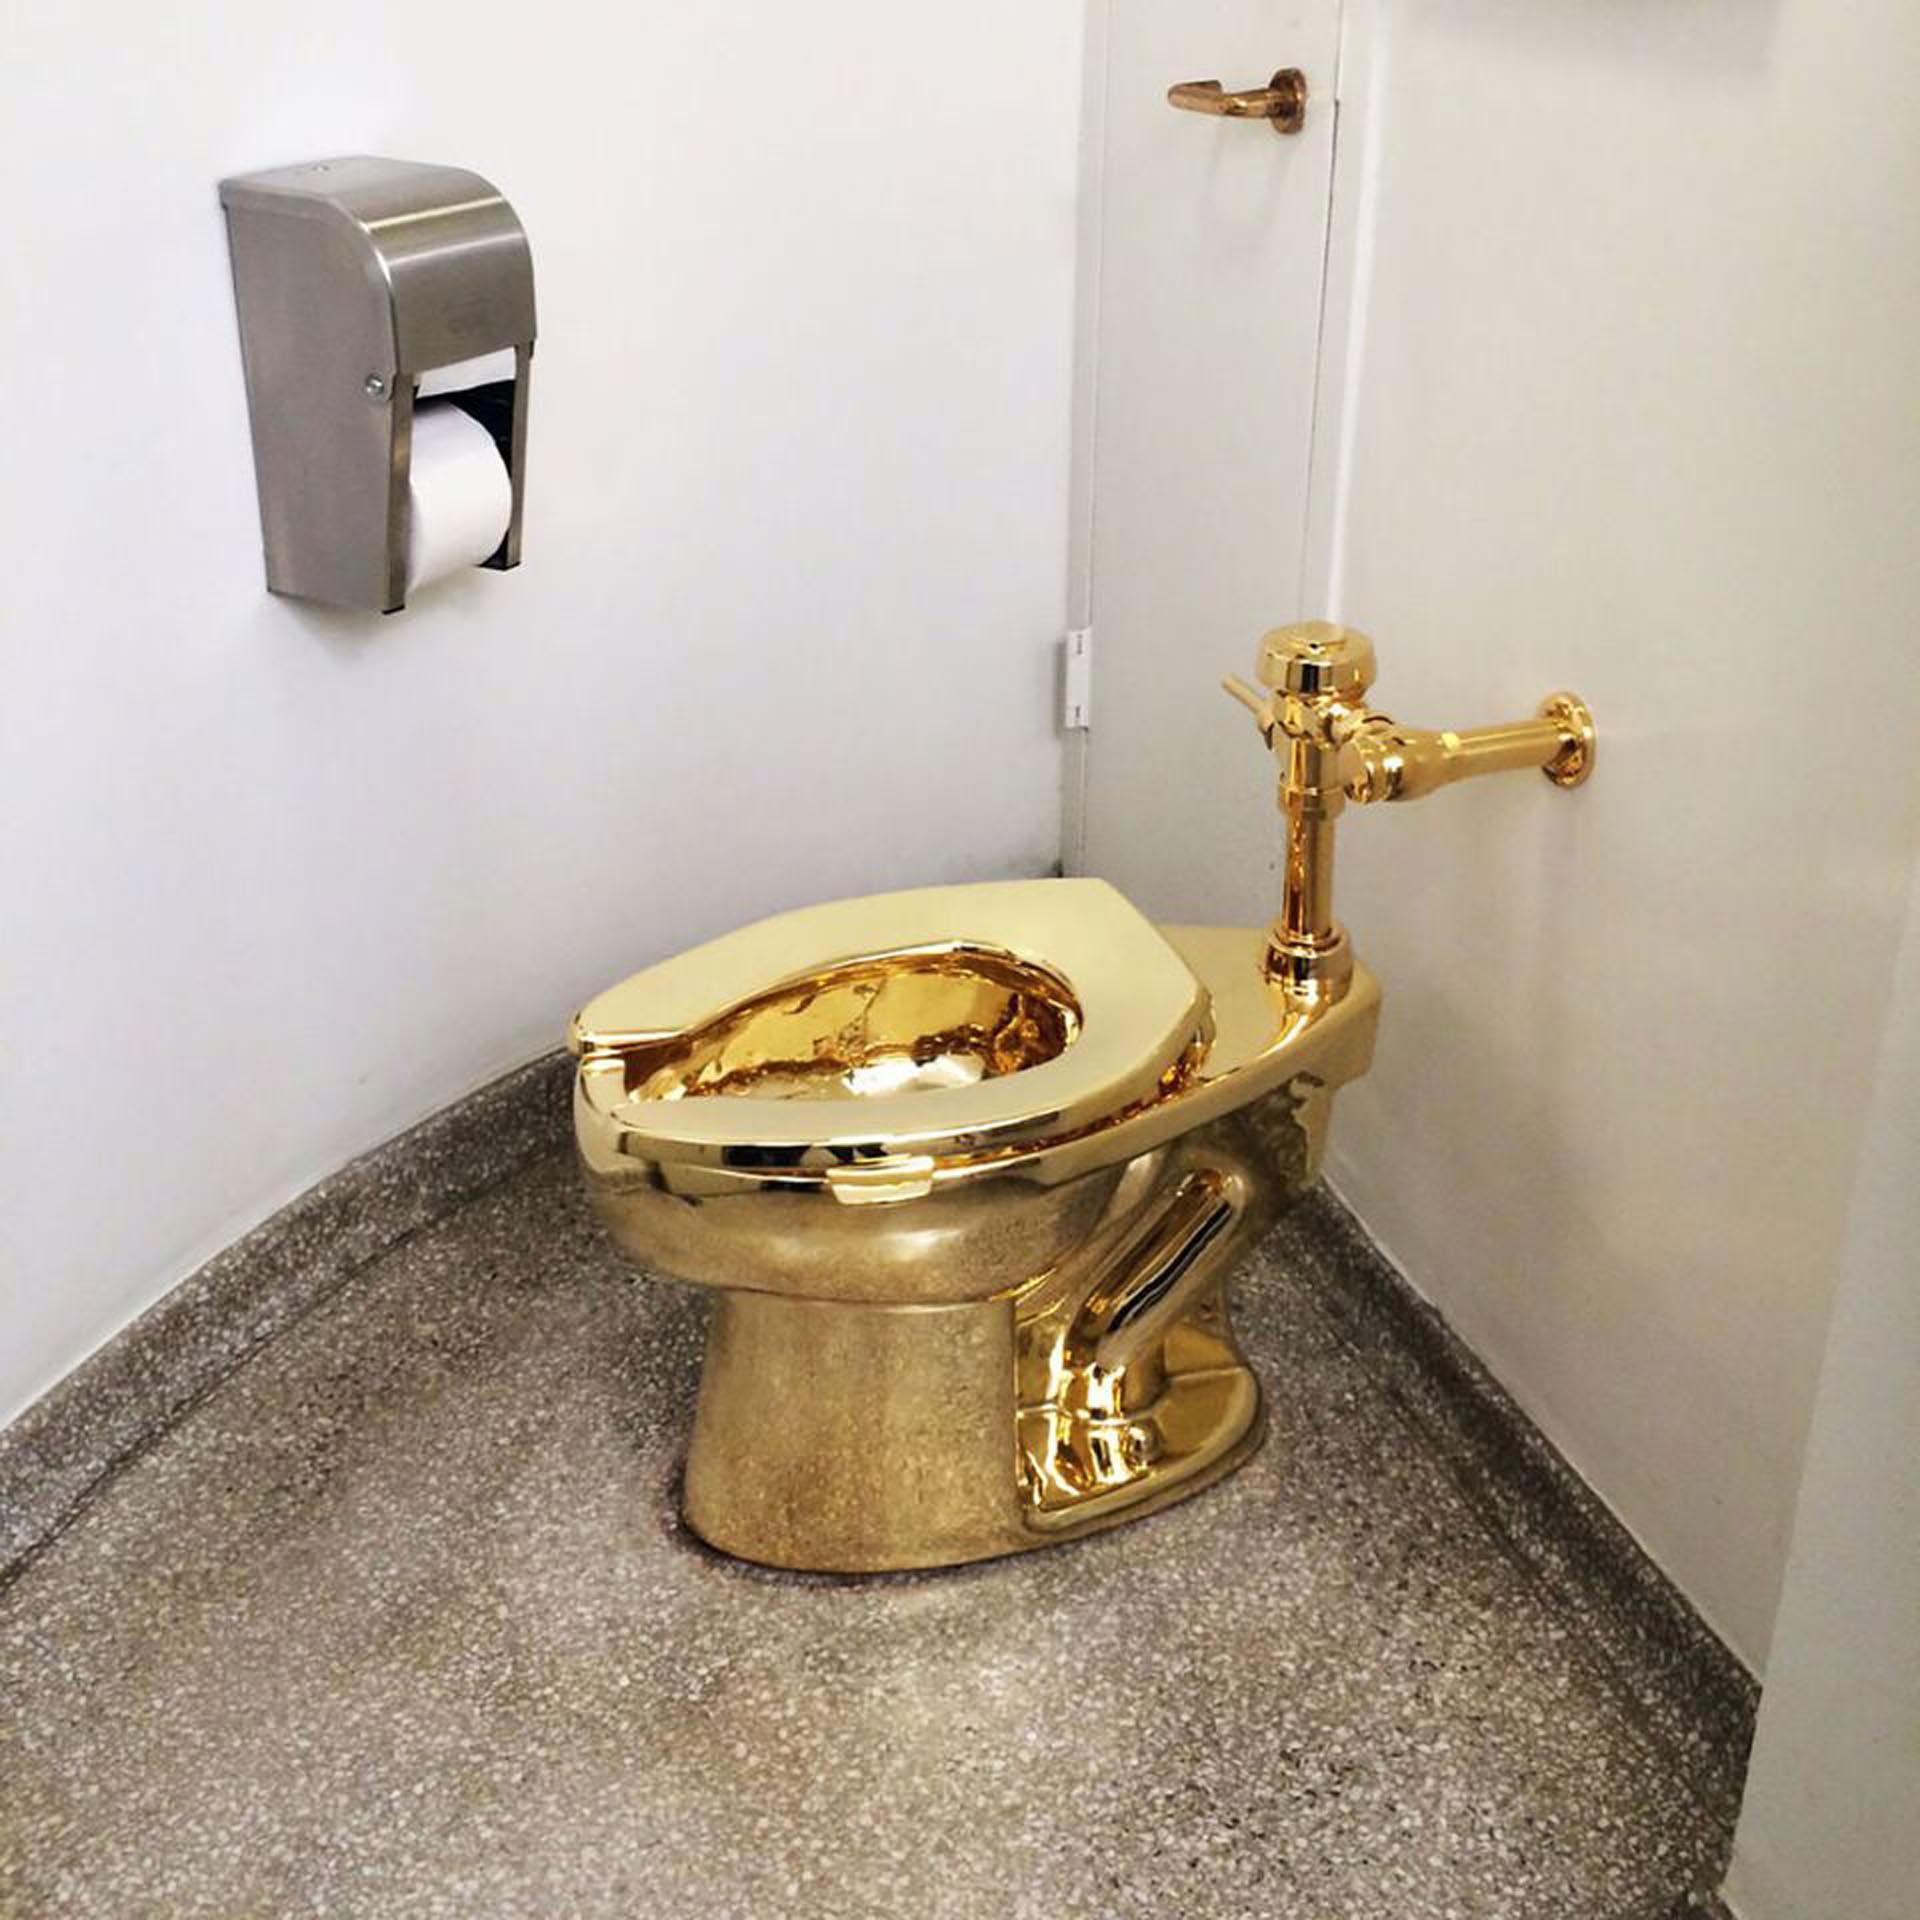 El inodoro de oro macizo de 18 kilates que instaló en el Museo Guggenheim